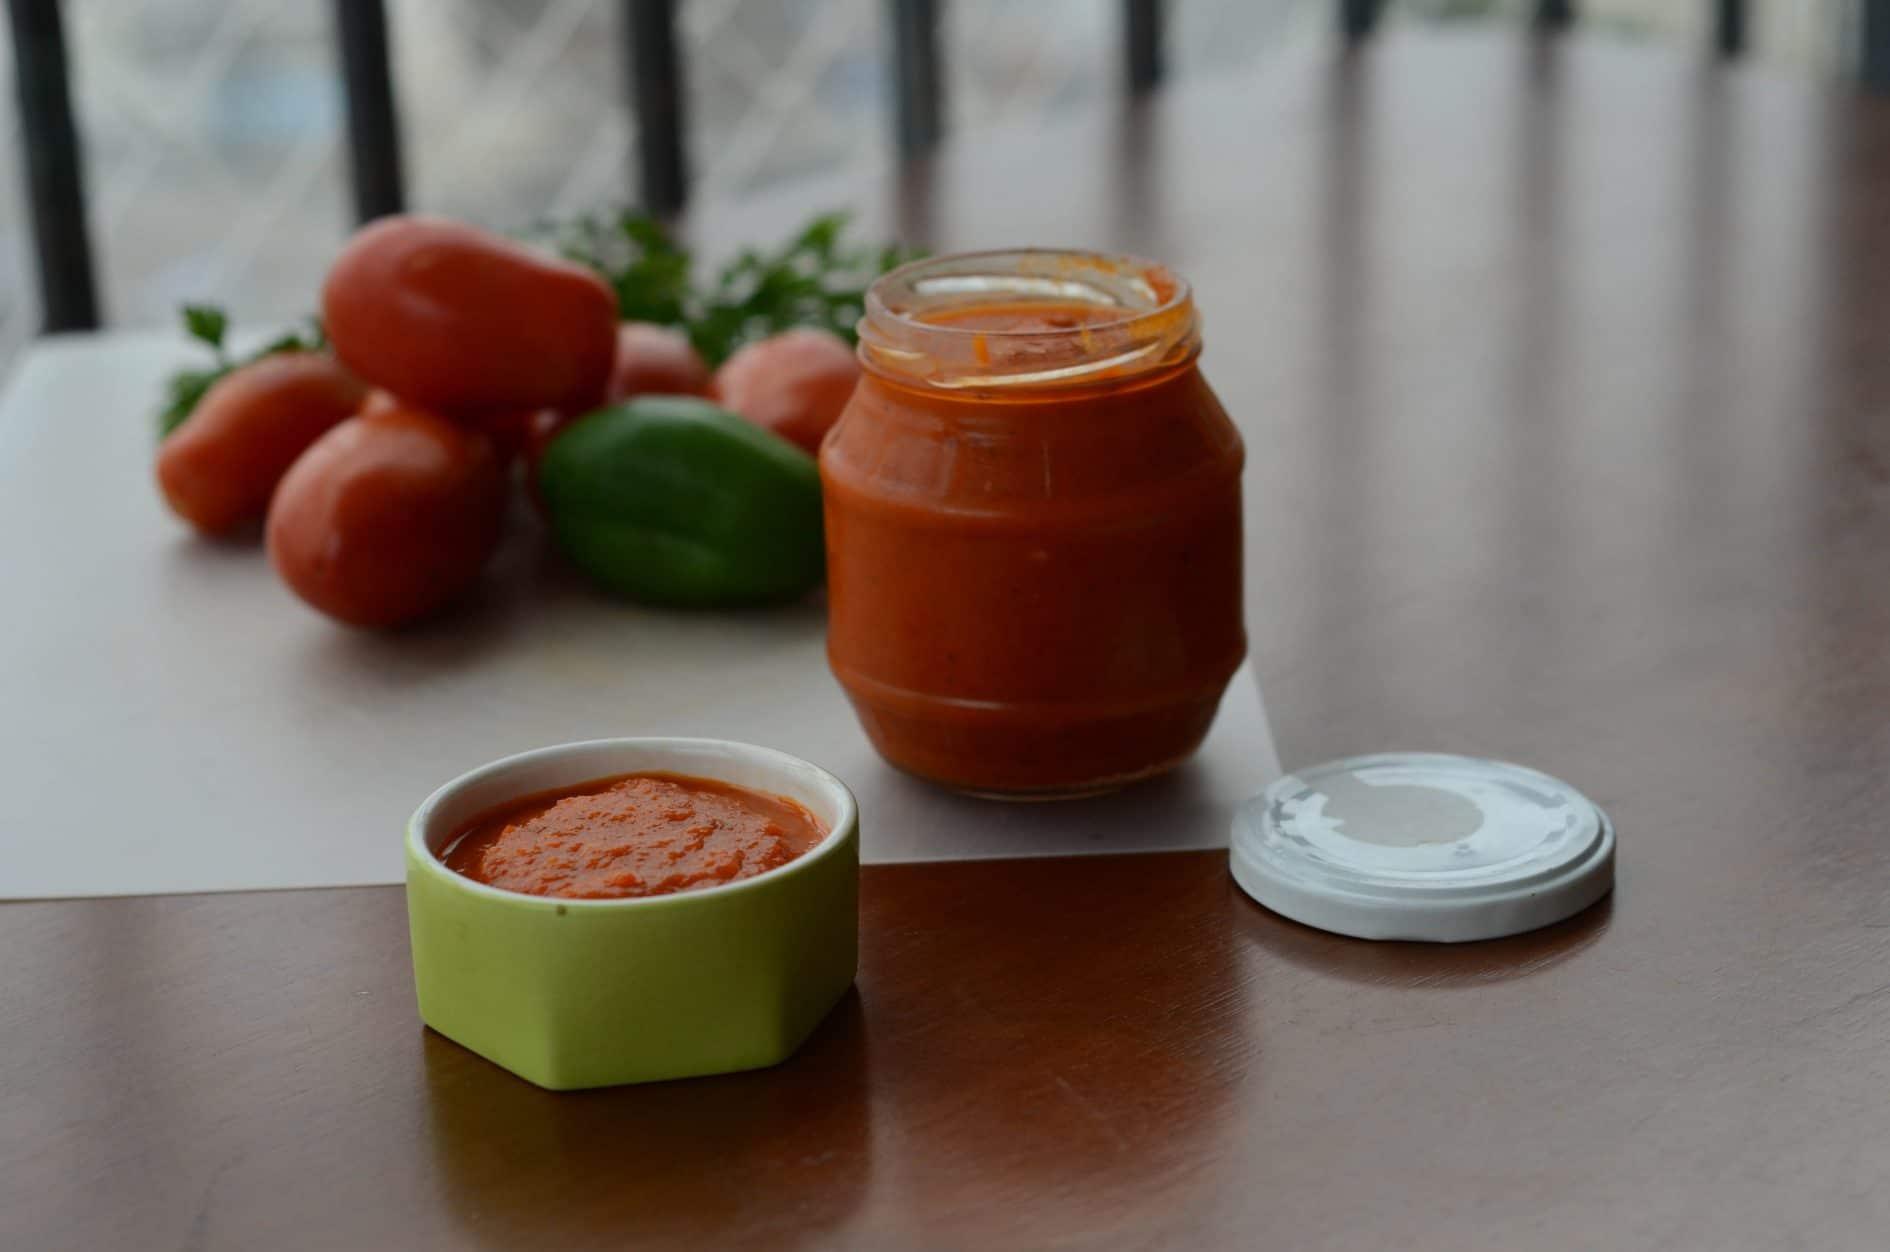 receita de molho de tomate caseiro, otimo para congelar